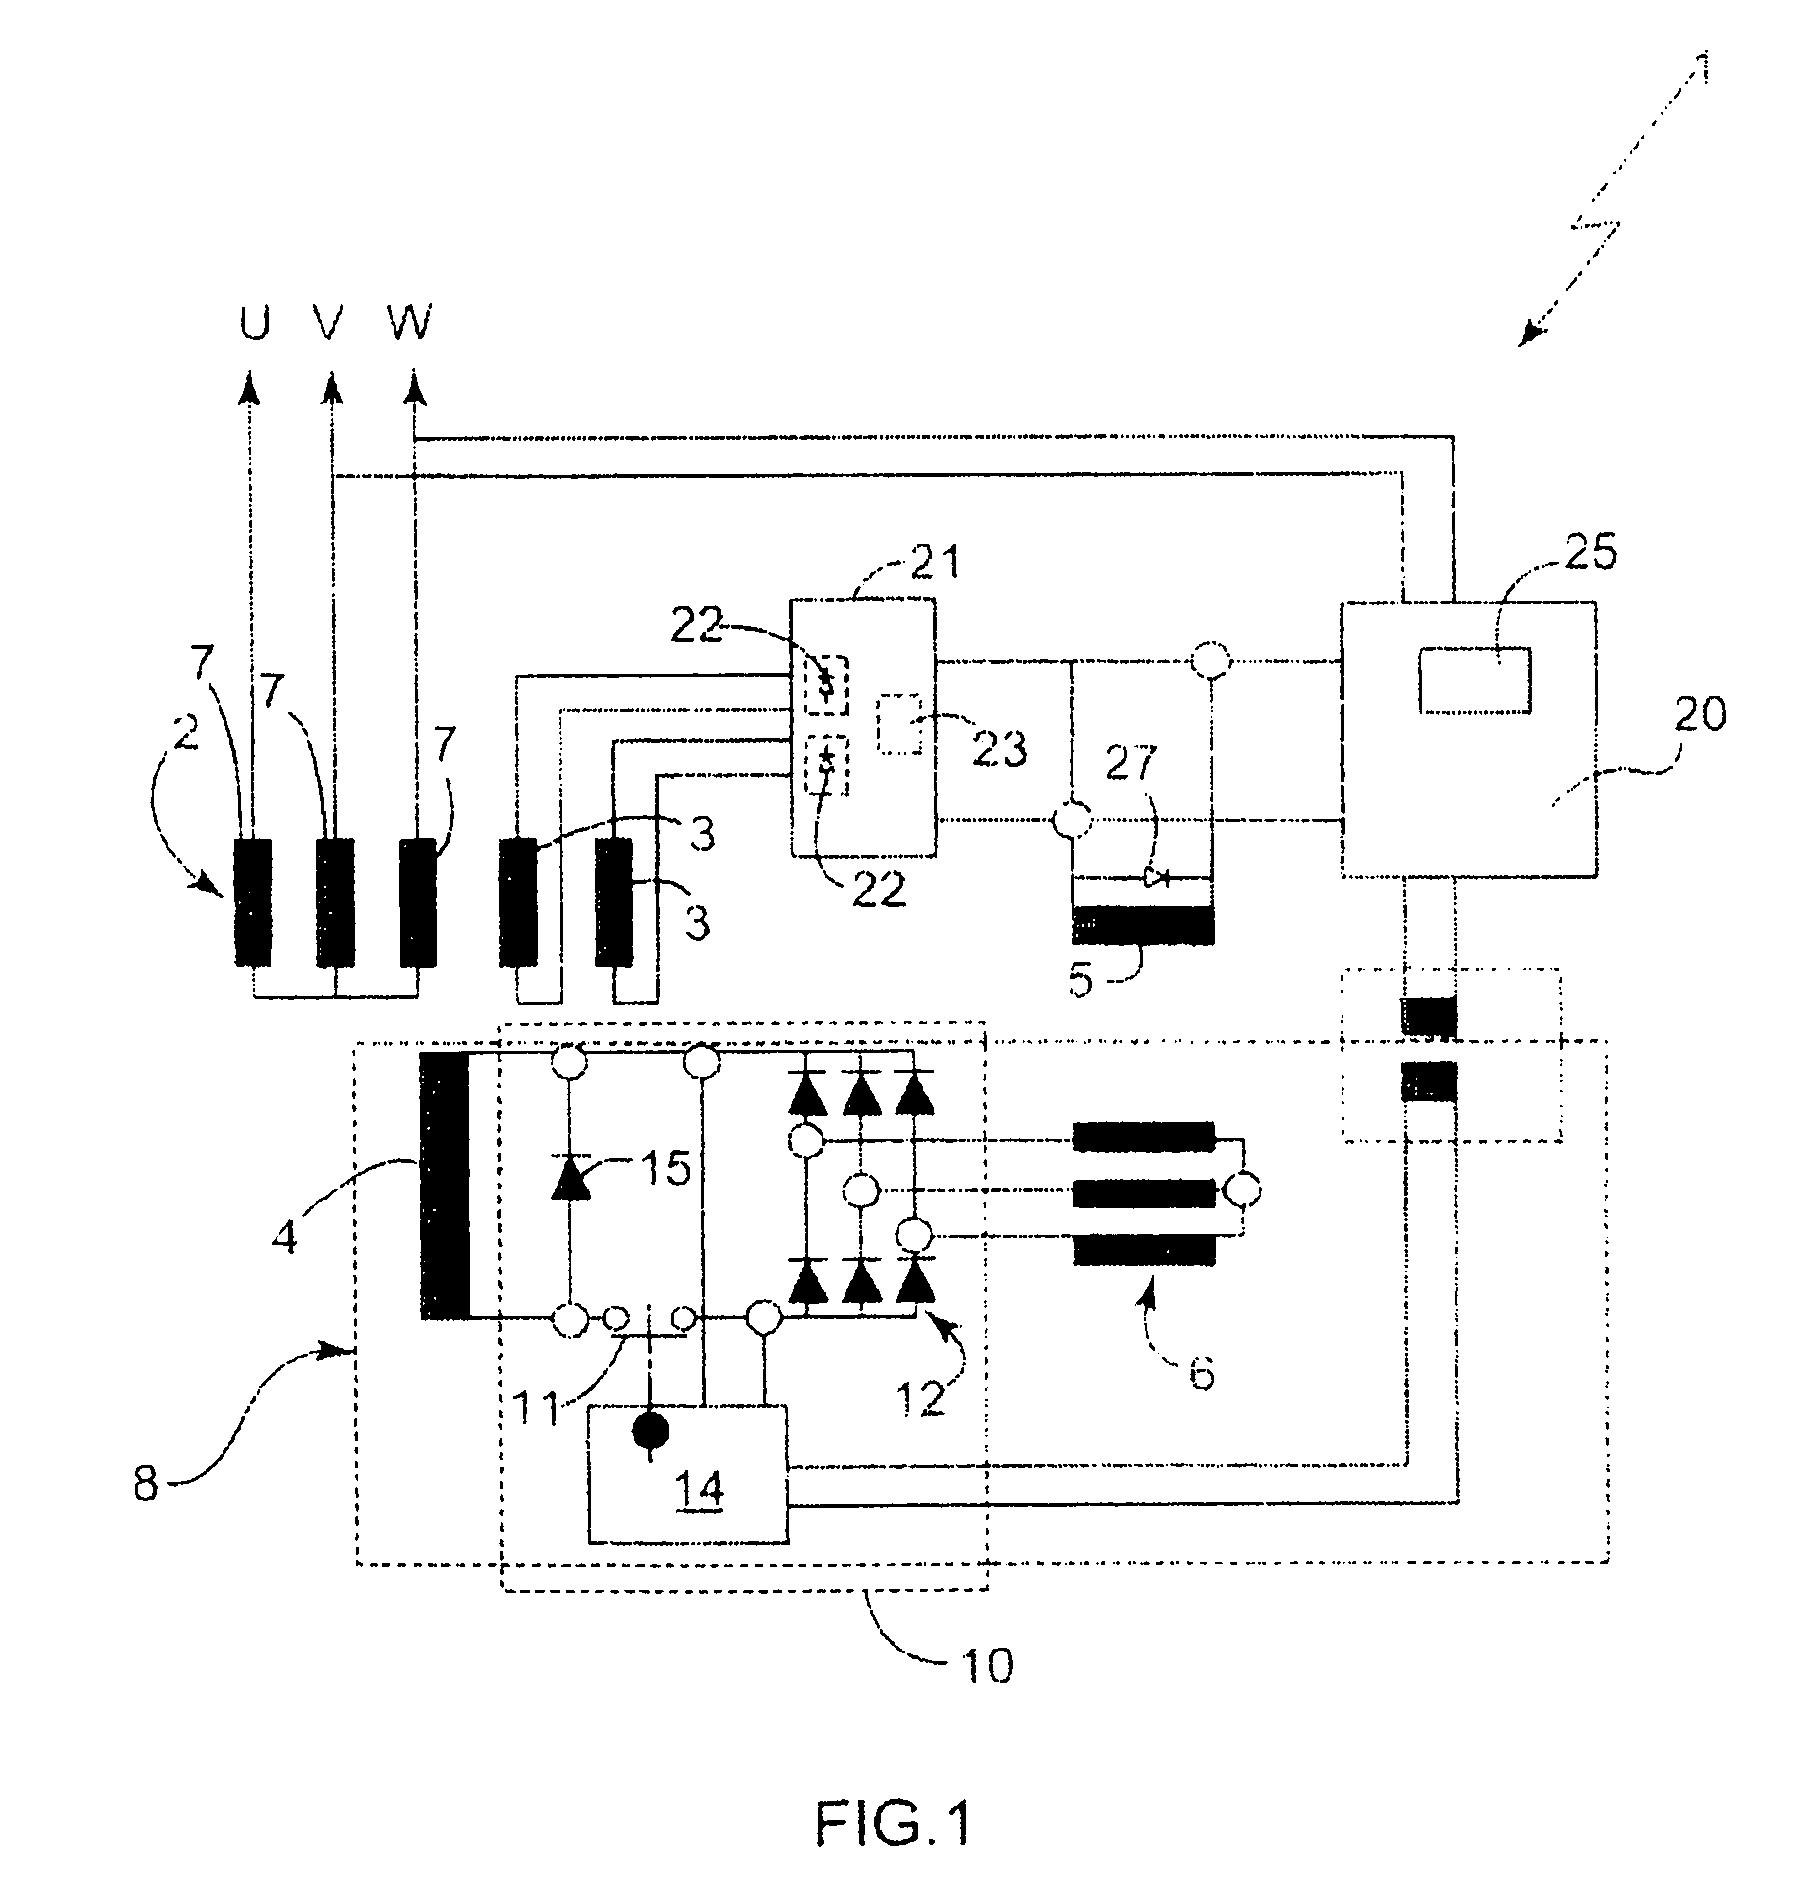 hight resolution of stamford generator wiring diagram stamford avr wiring diagrams stamford generator wiring diagram zig zag